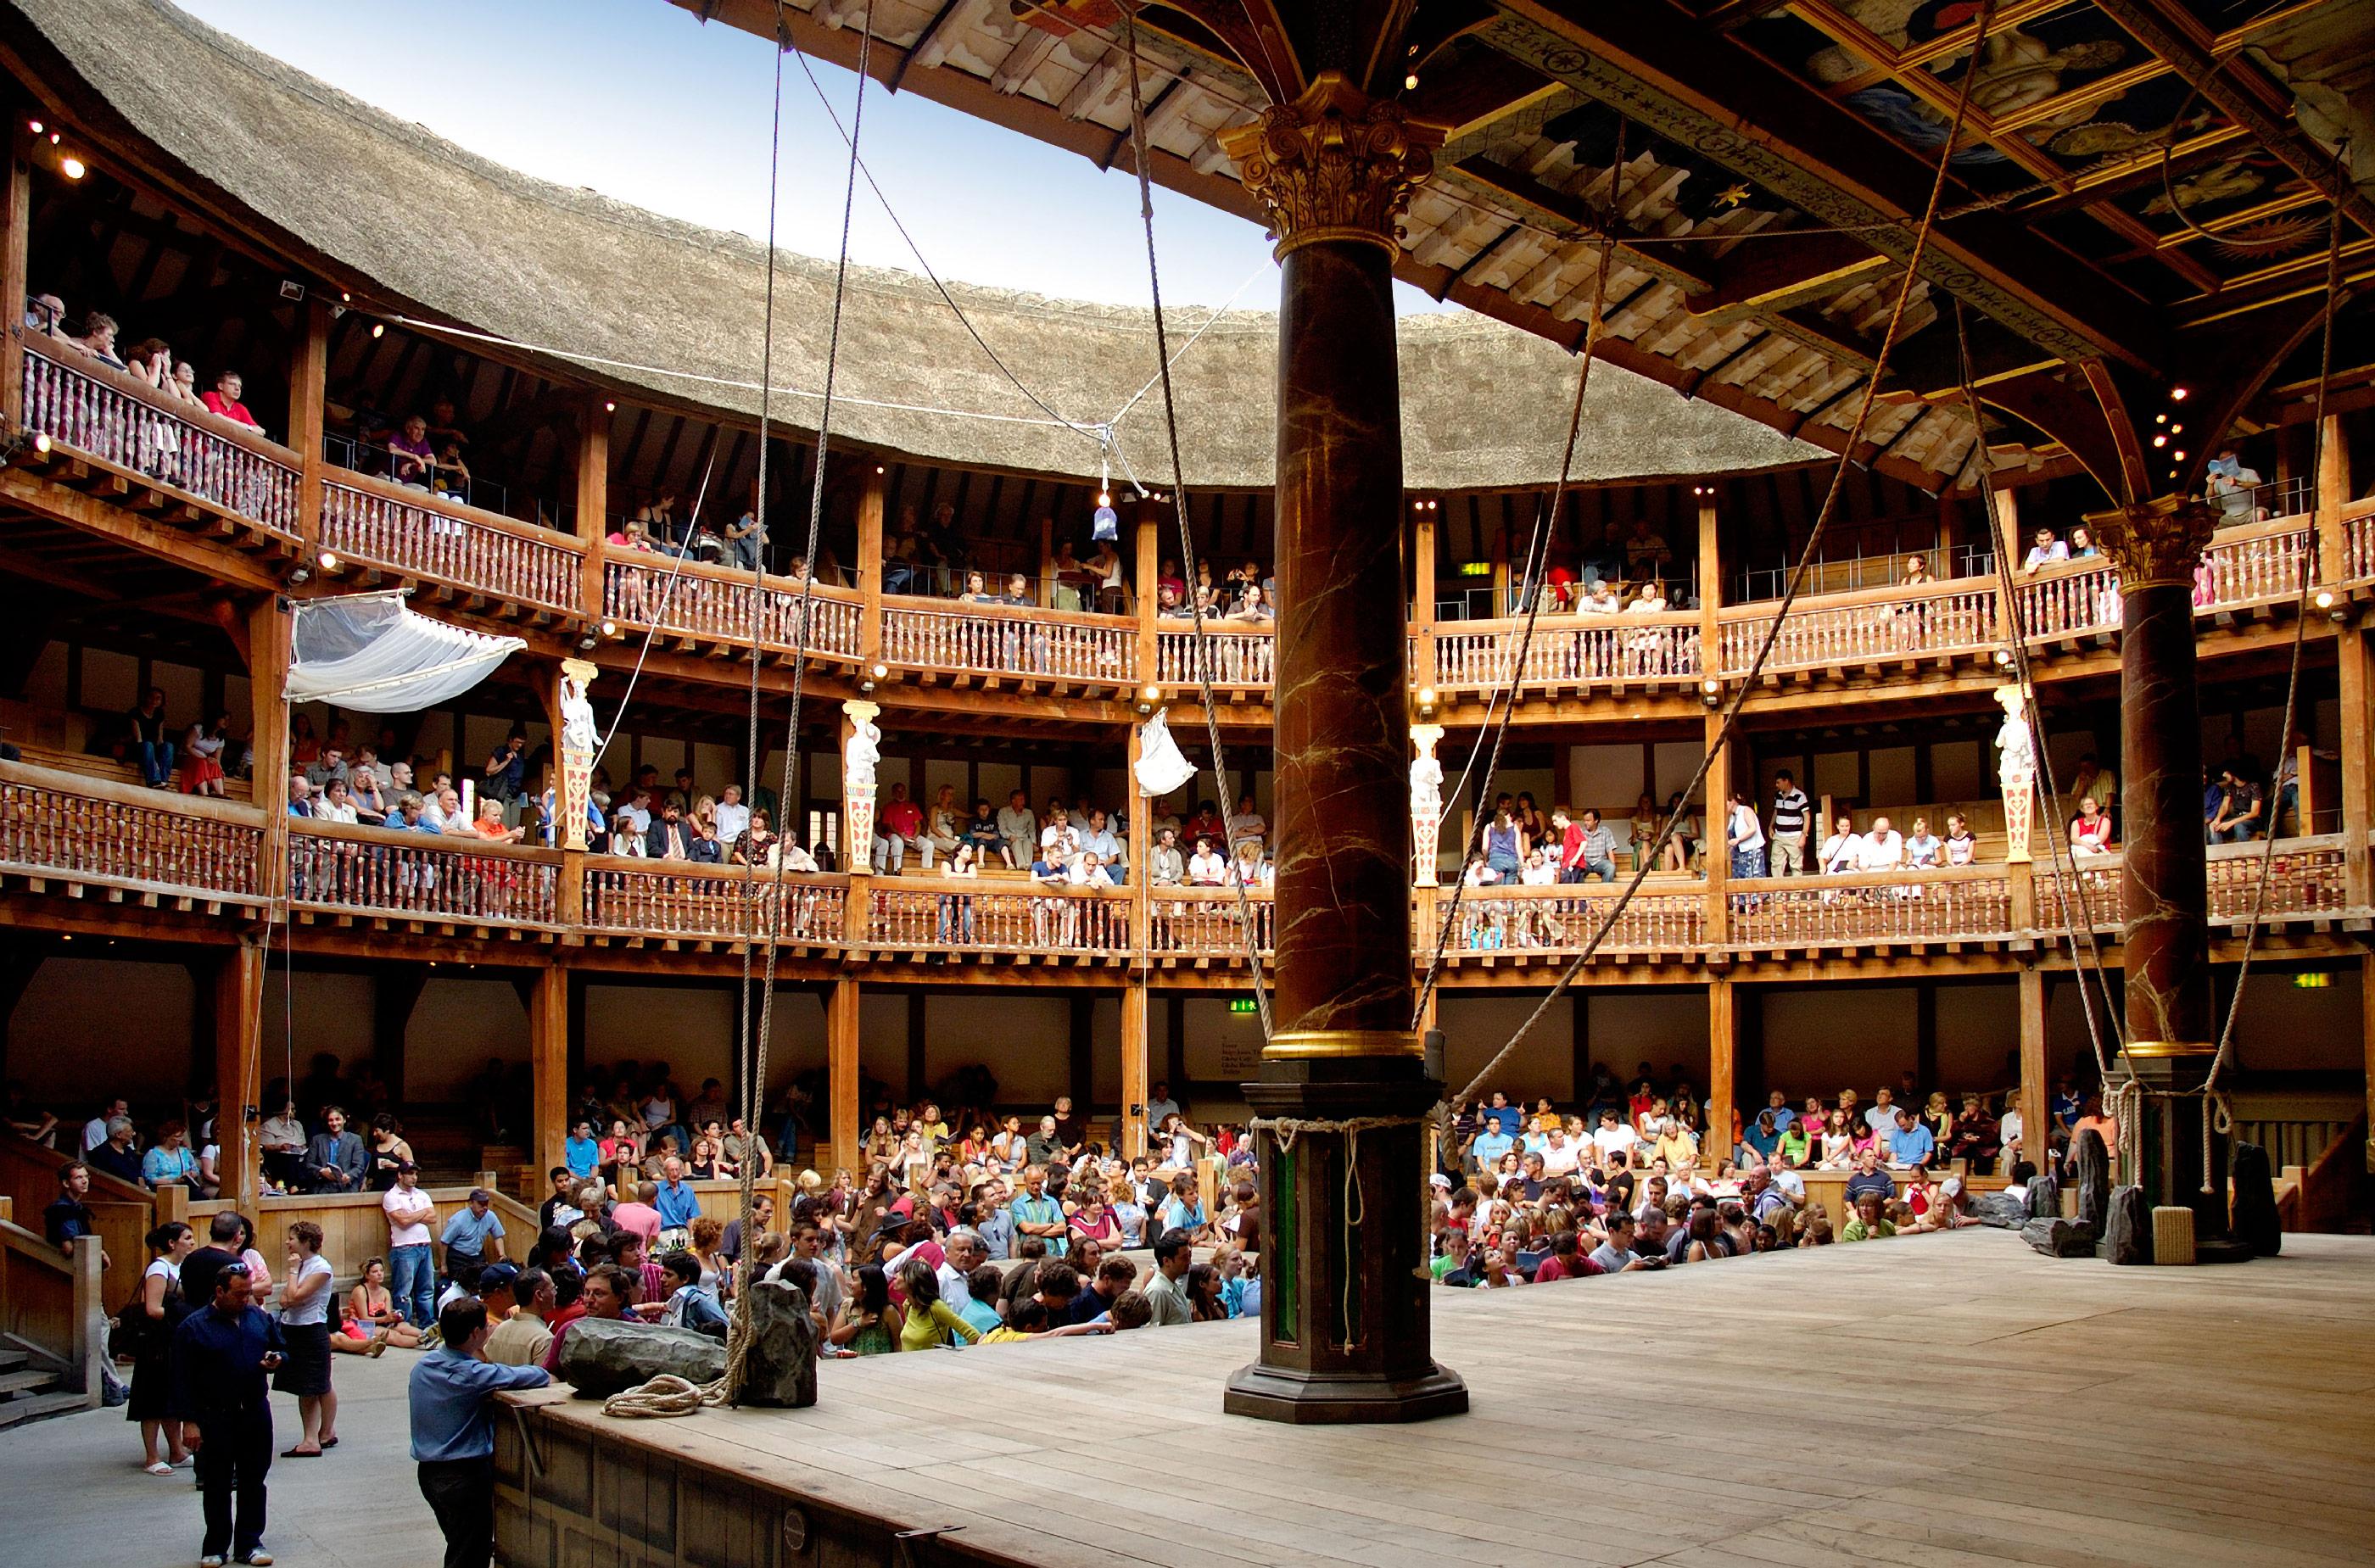 Interior of Shakespeares Globe Theatre, London, England